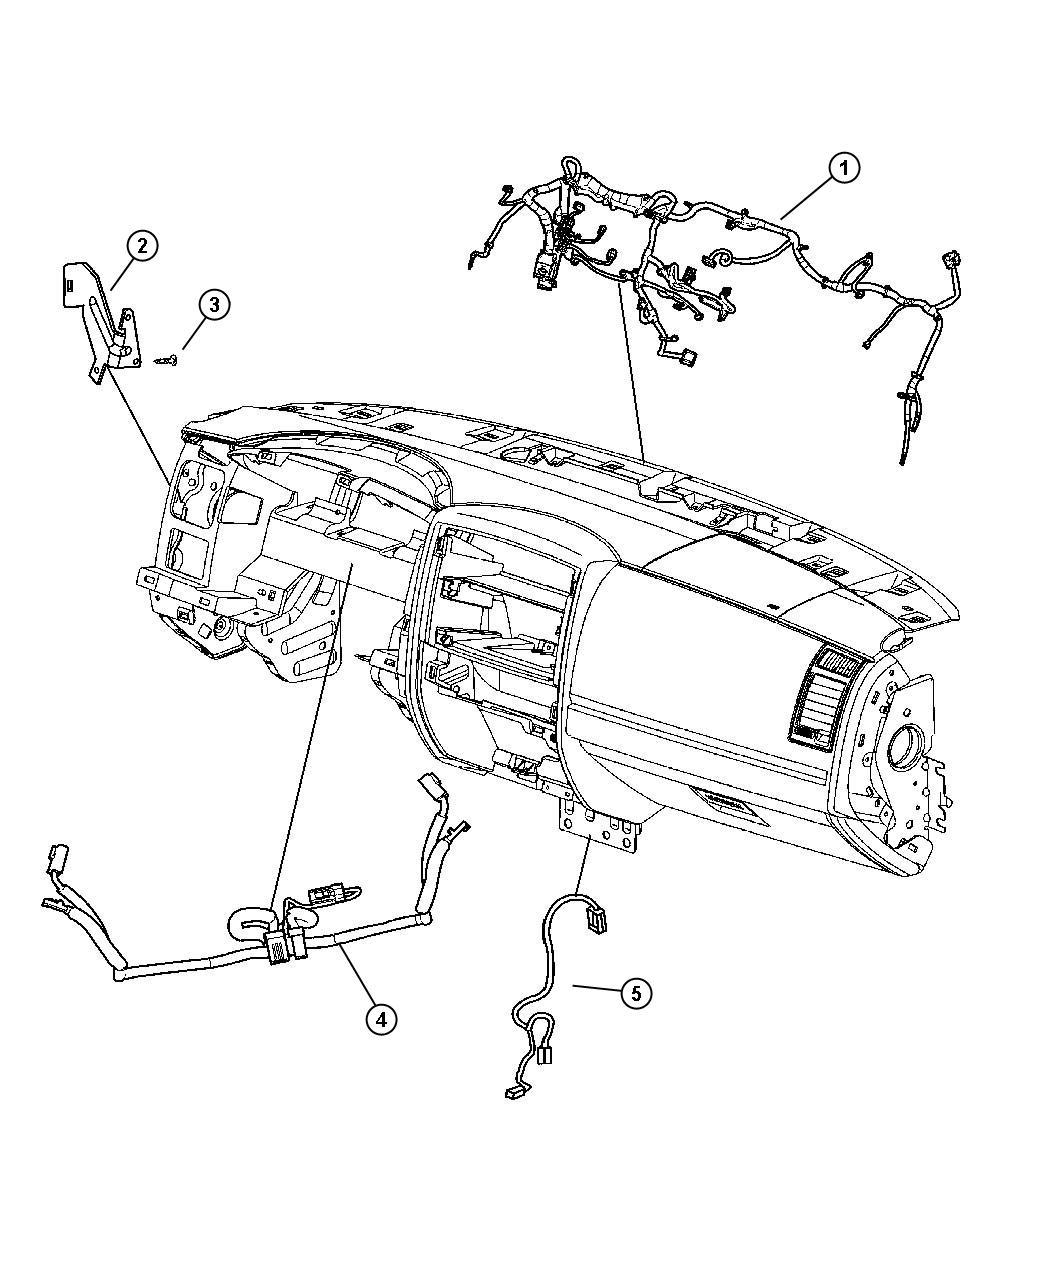 2006 Dodge Dakota SLT QUAD CAB 4.7L V8 A/T 4X2 Wiring